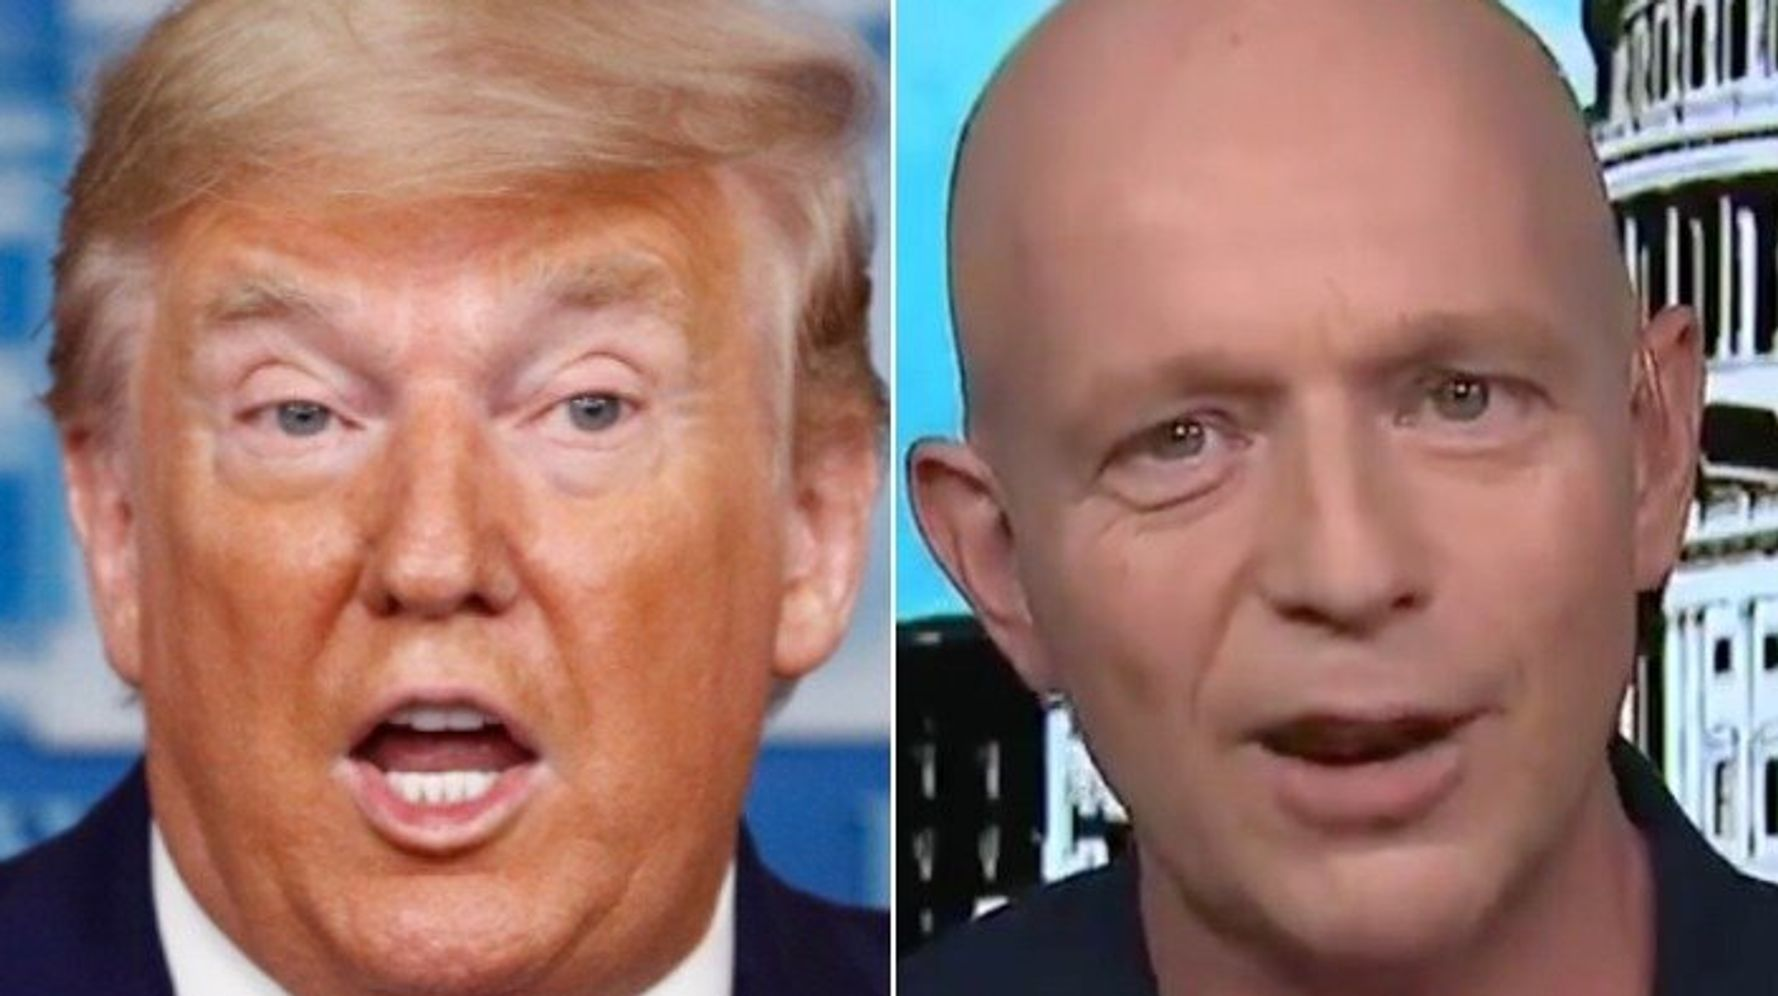 Trump Repeats Latest Bonkers Fox News Coronavirus Claims In Midnight Rant